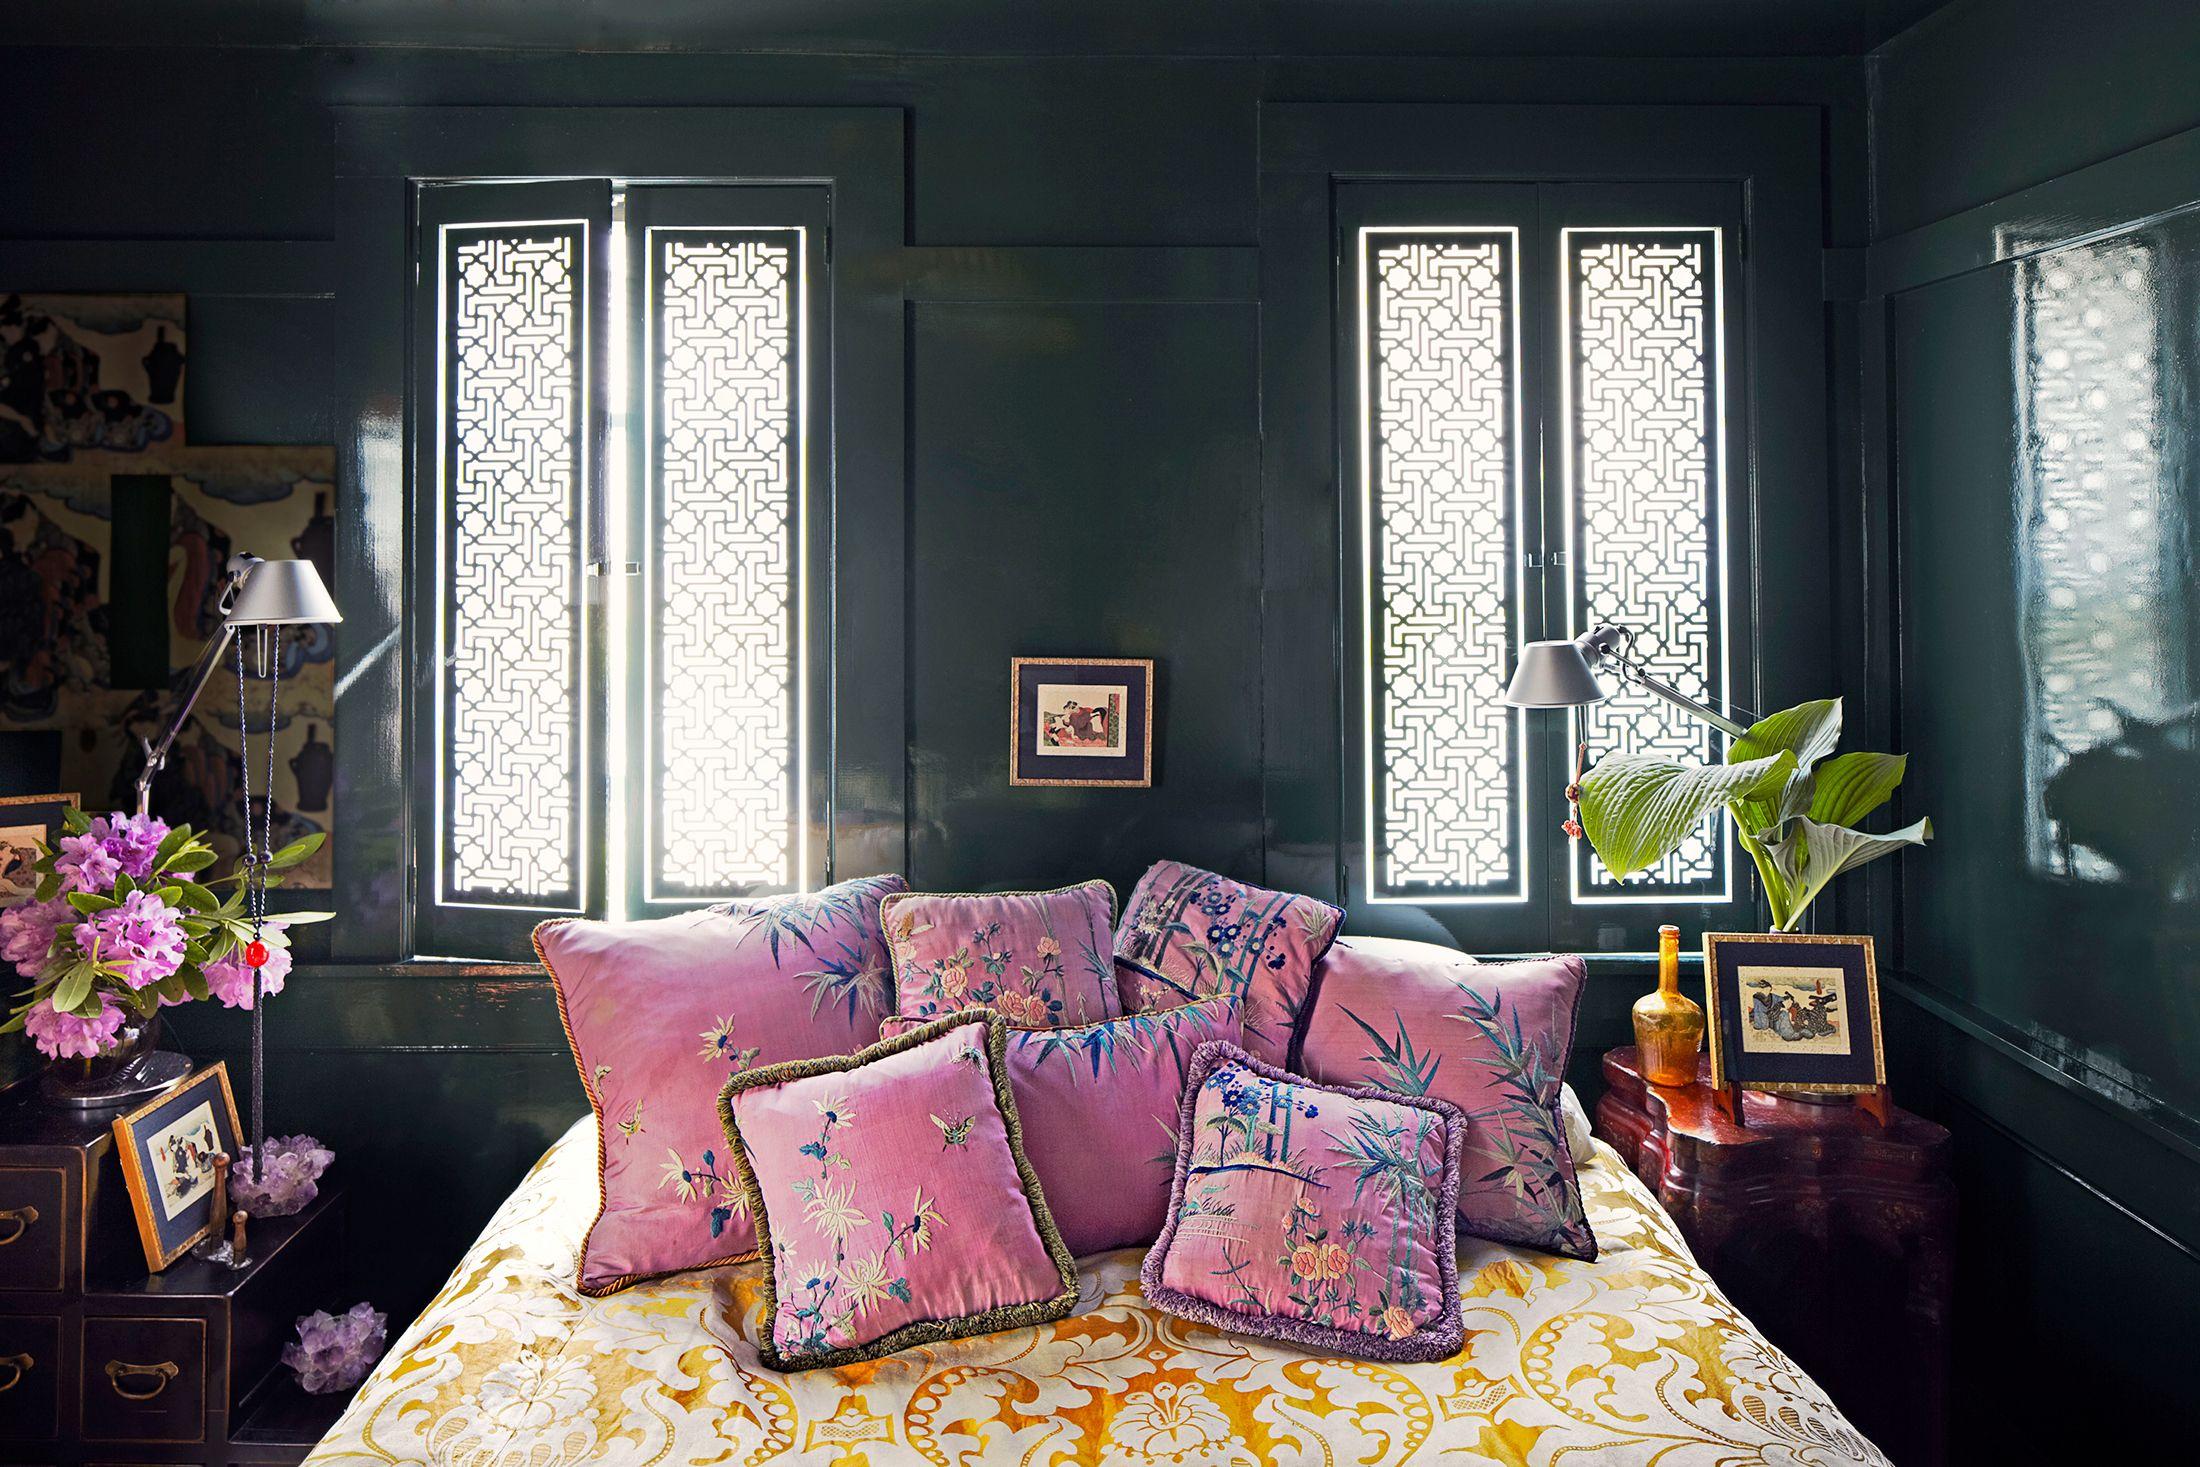 65 Stylish Bedroom Design Ideas - Modern Bedrooms Decorating Tips